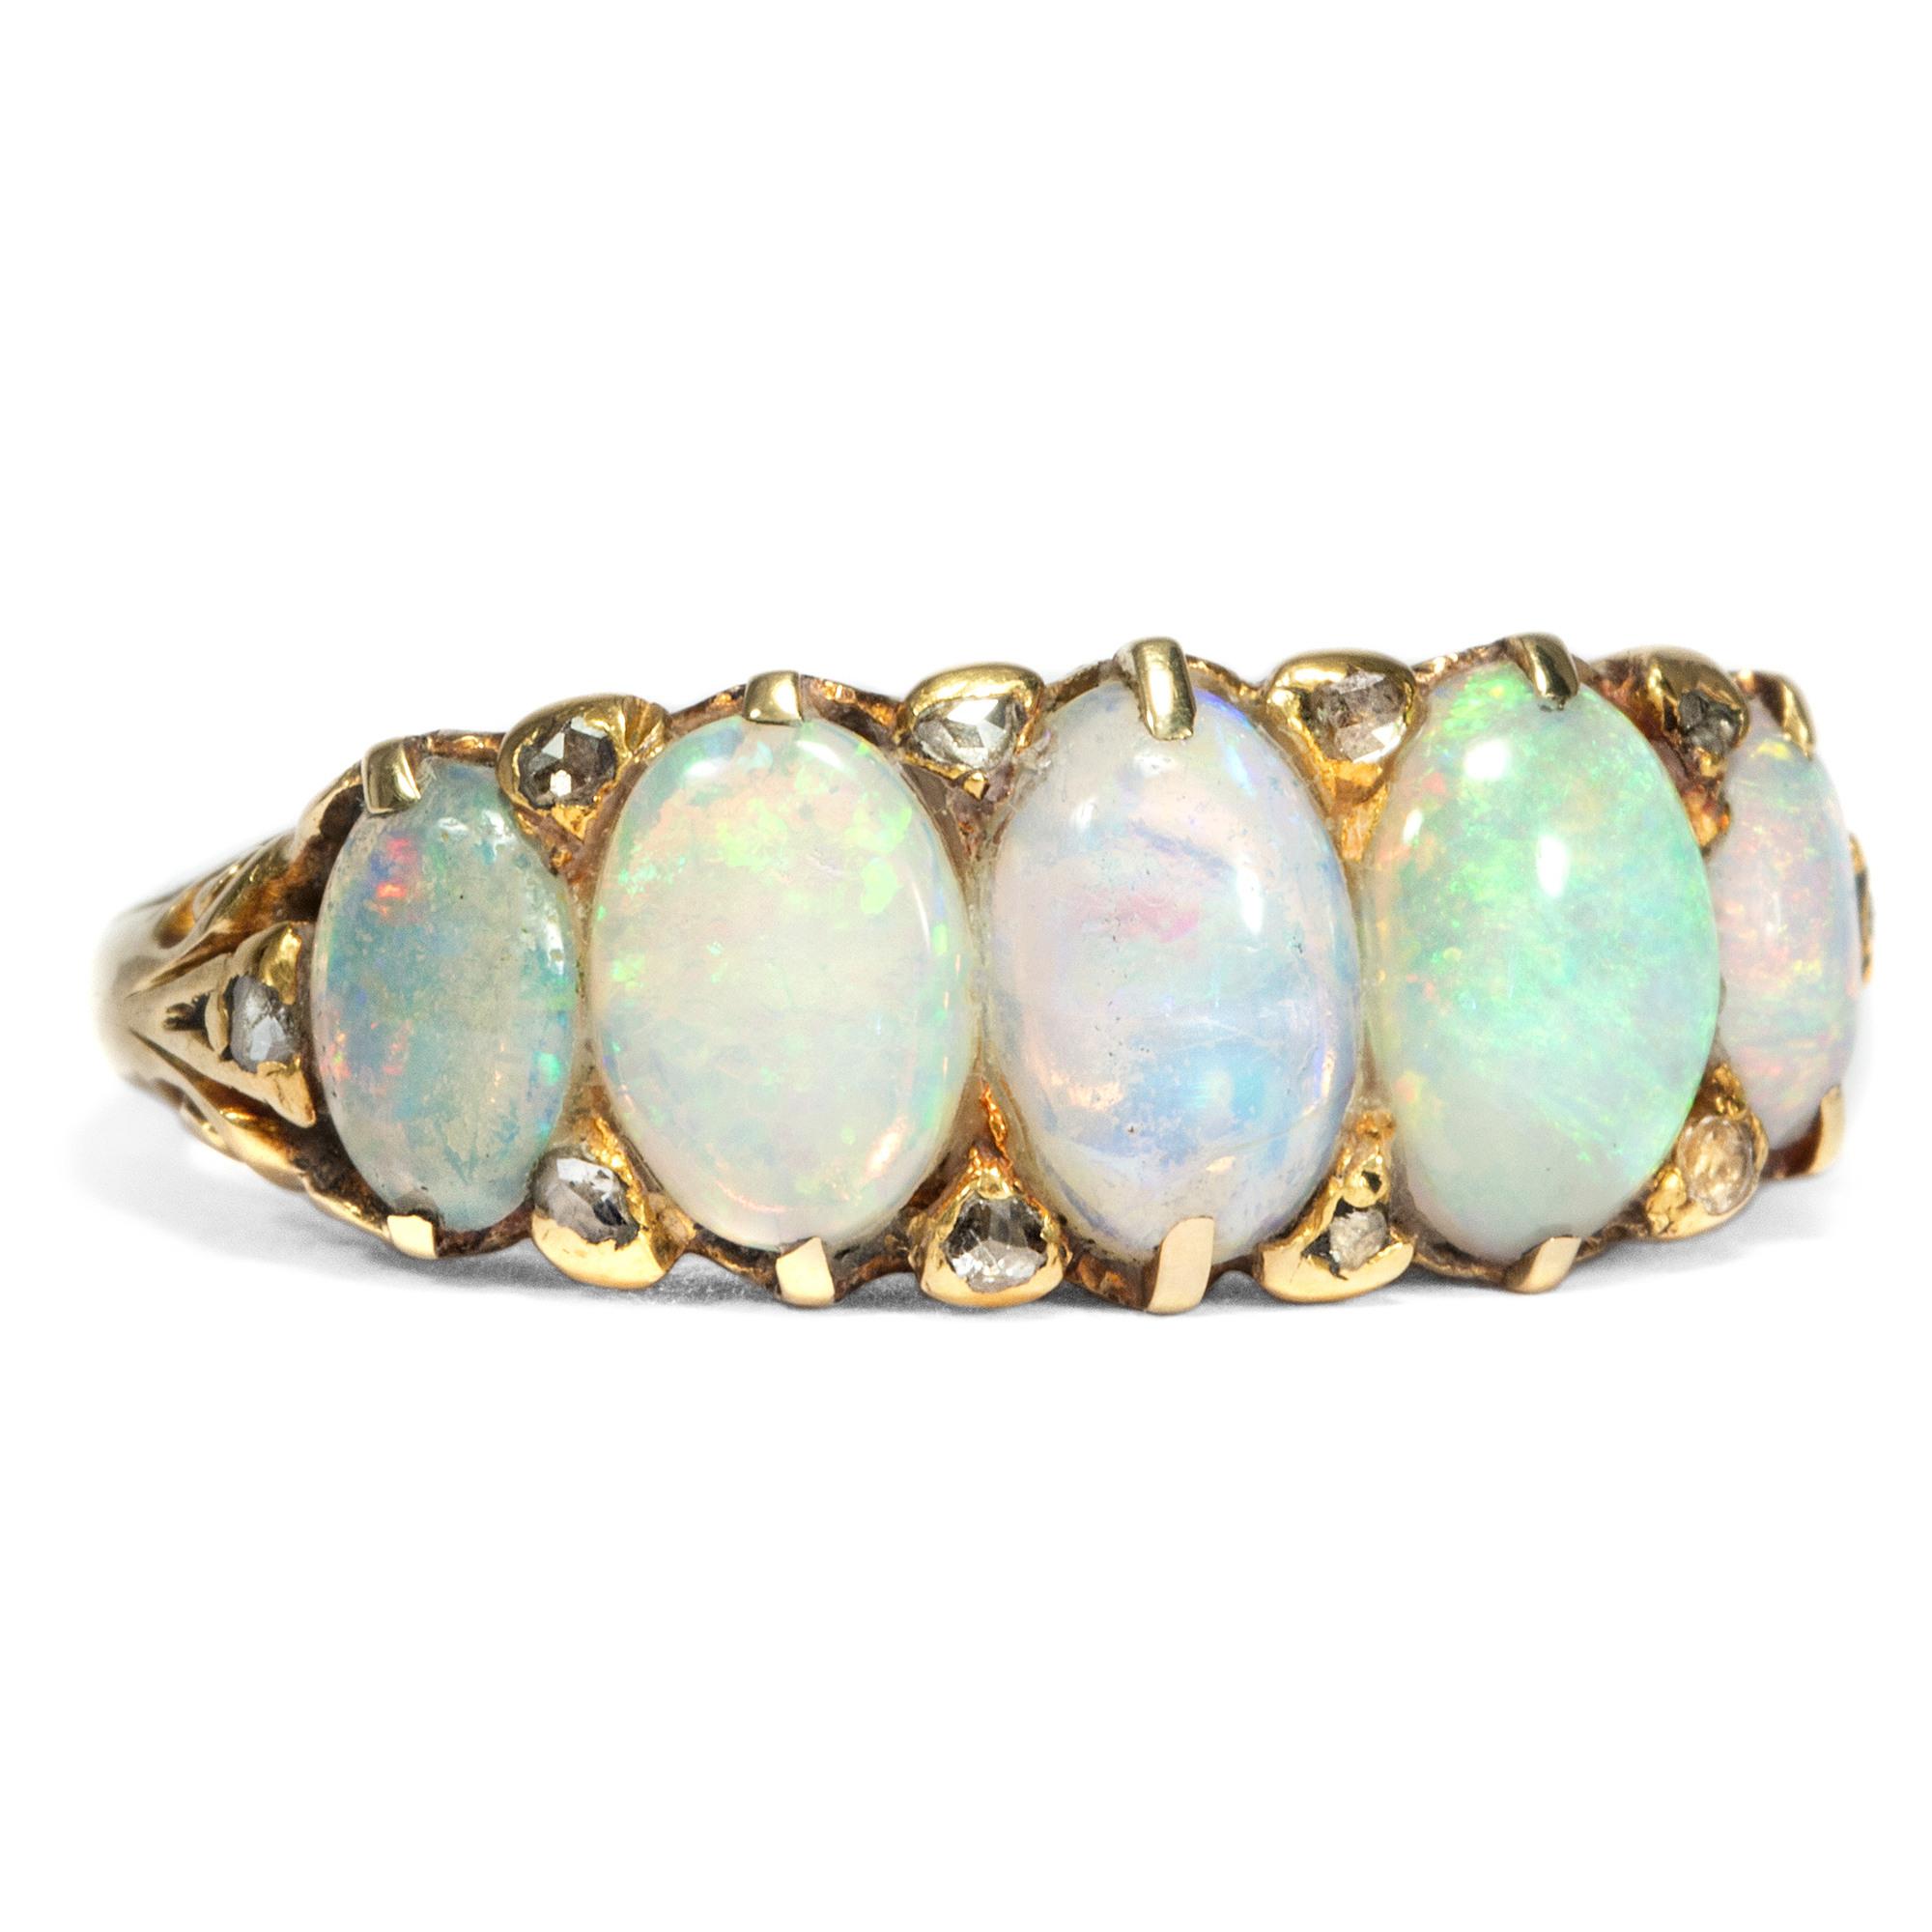 Details Zu Victorian Um 1900: Antiker Opal Diamant Ring Aus Gold, Vollopale  Opale Diamanten